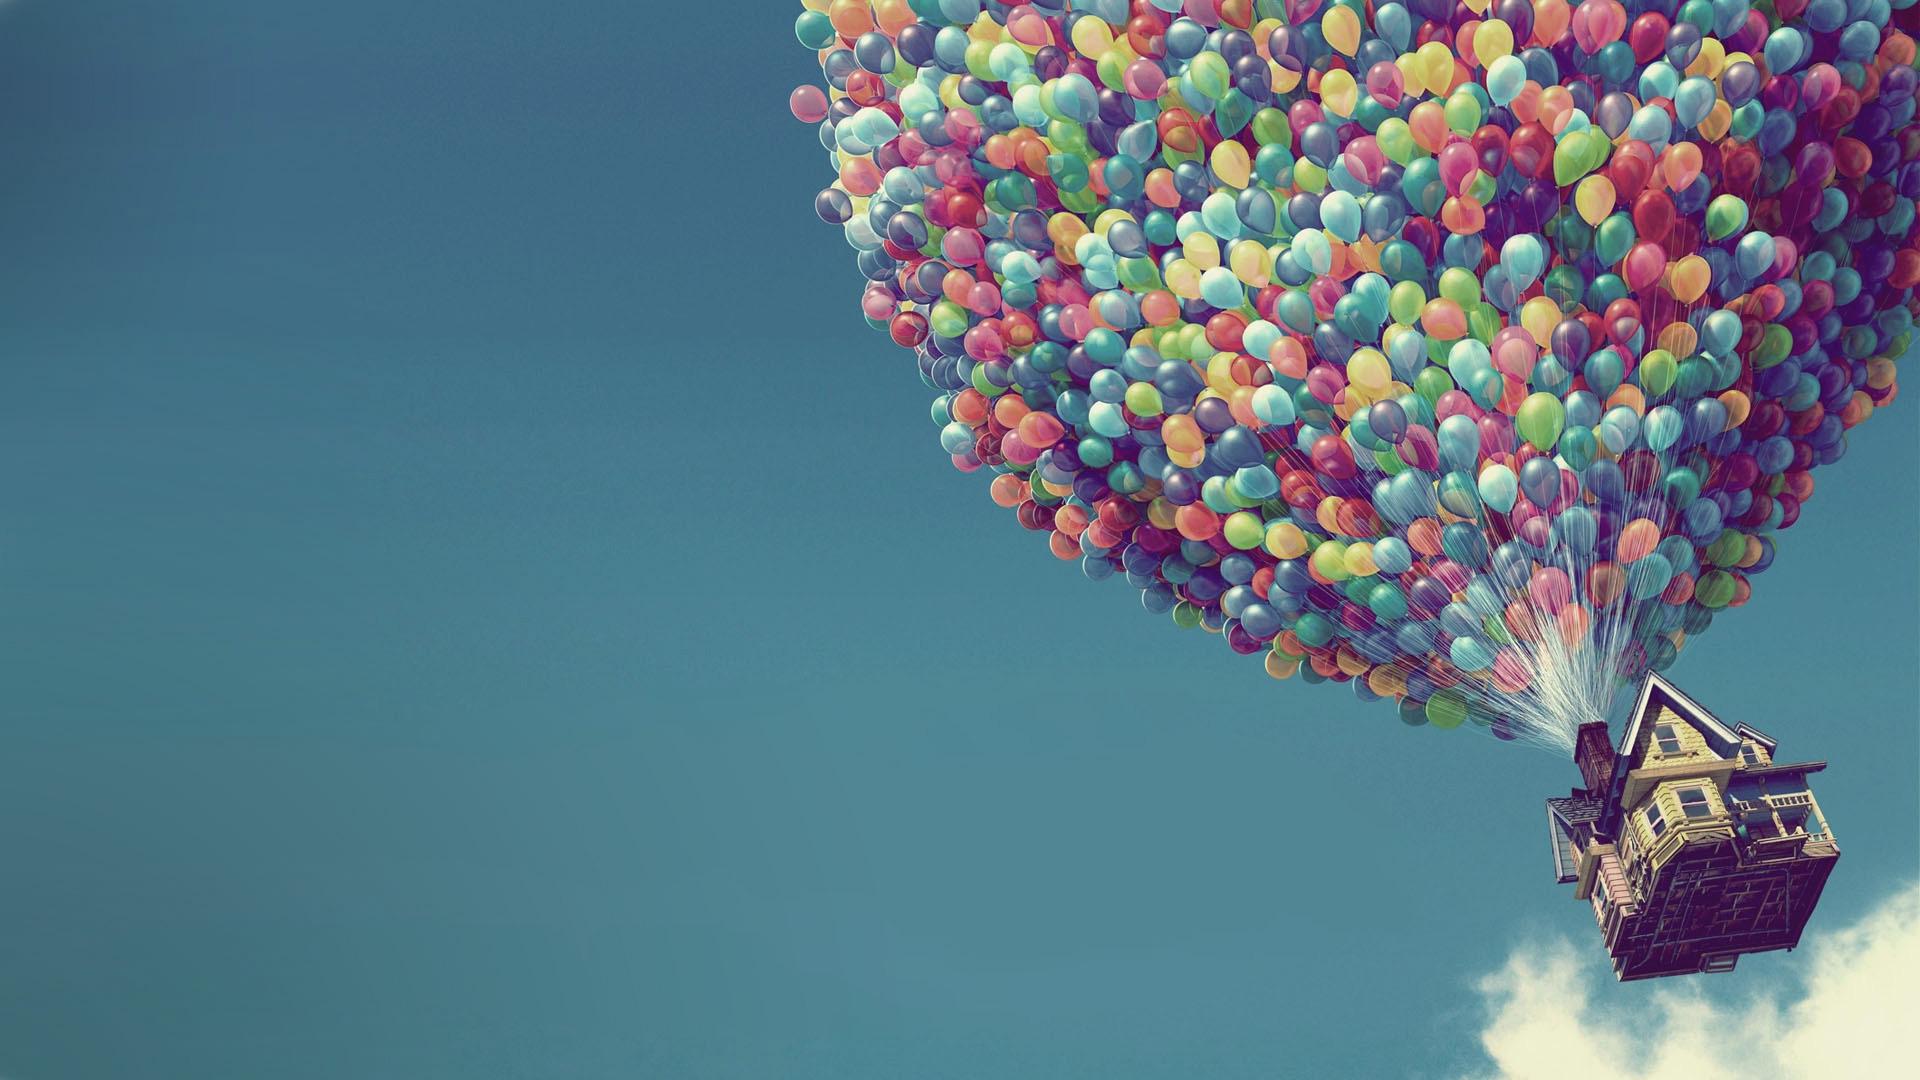 UP Disney Pixar cartoon Full HD Wallpaper Balloons and the House 1920x1080